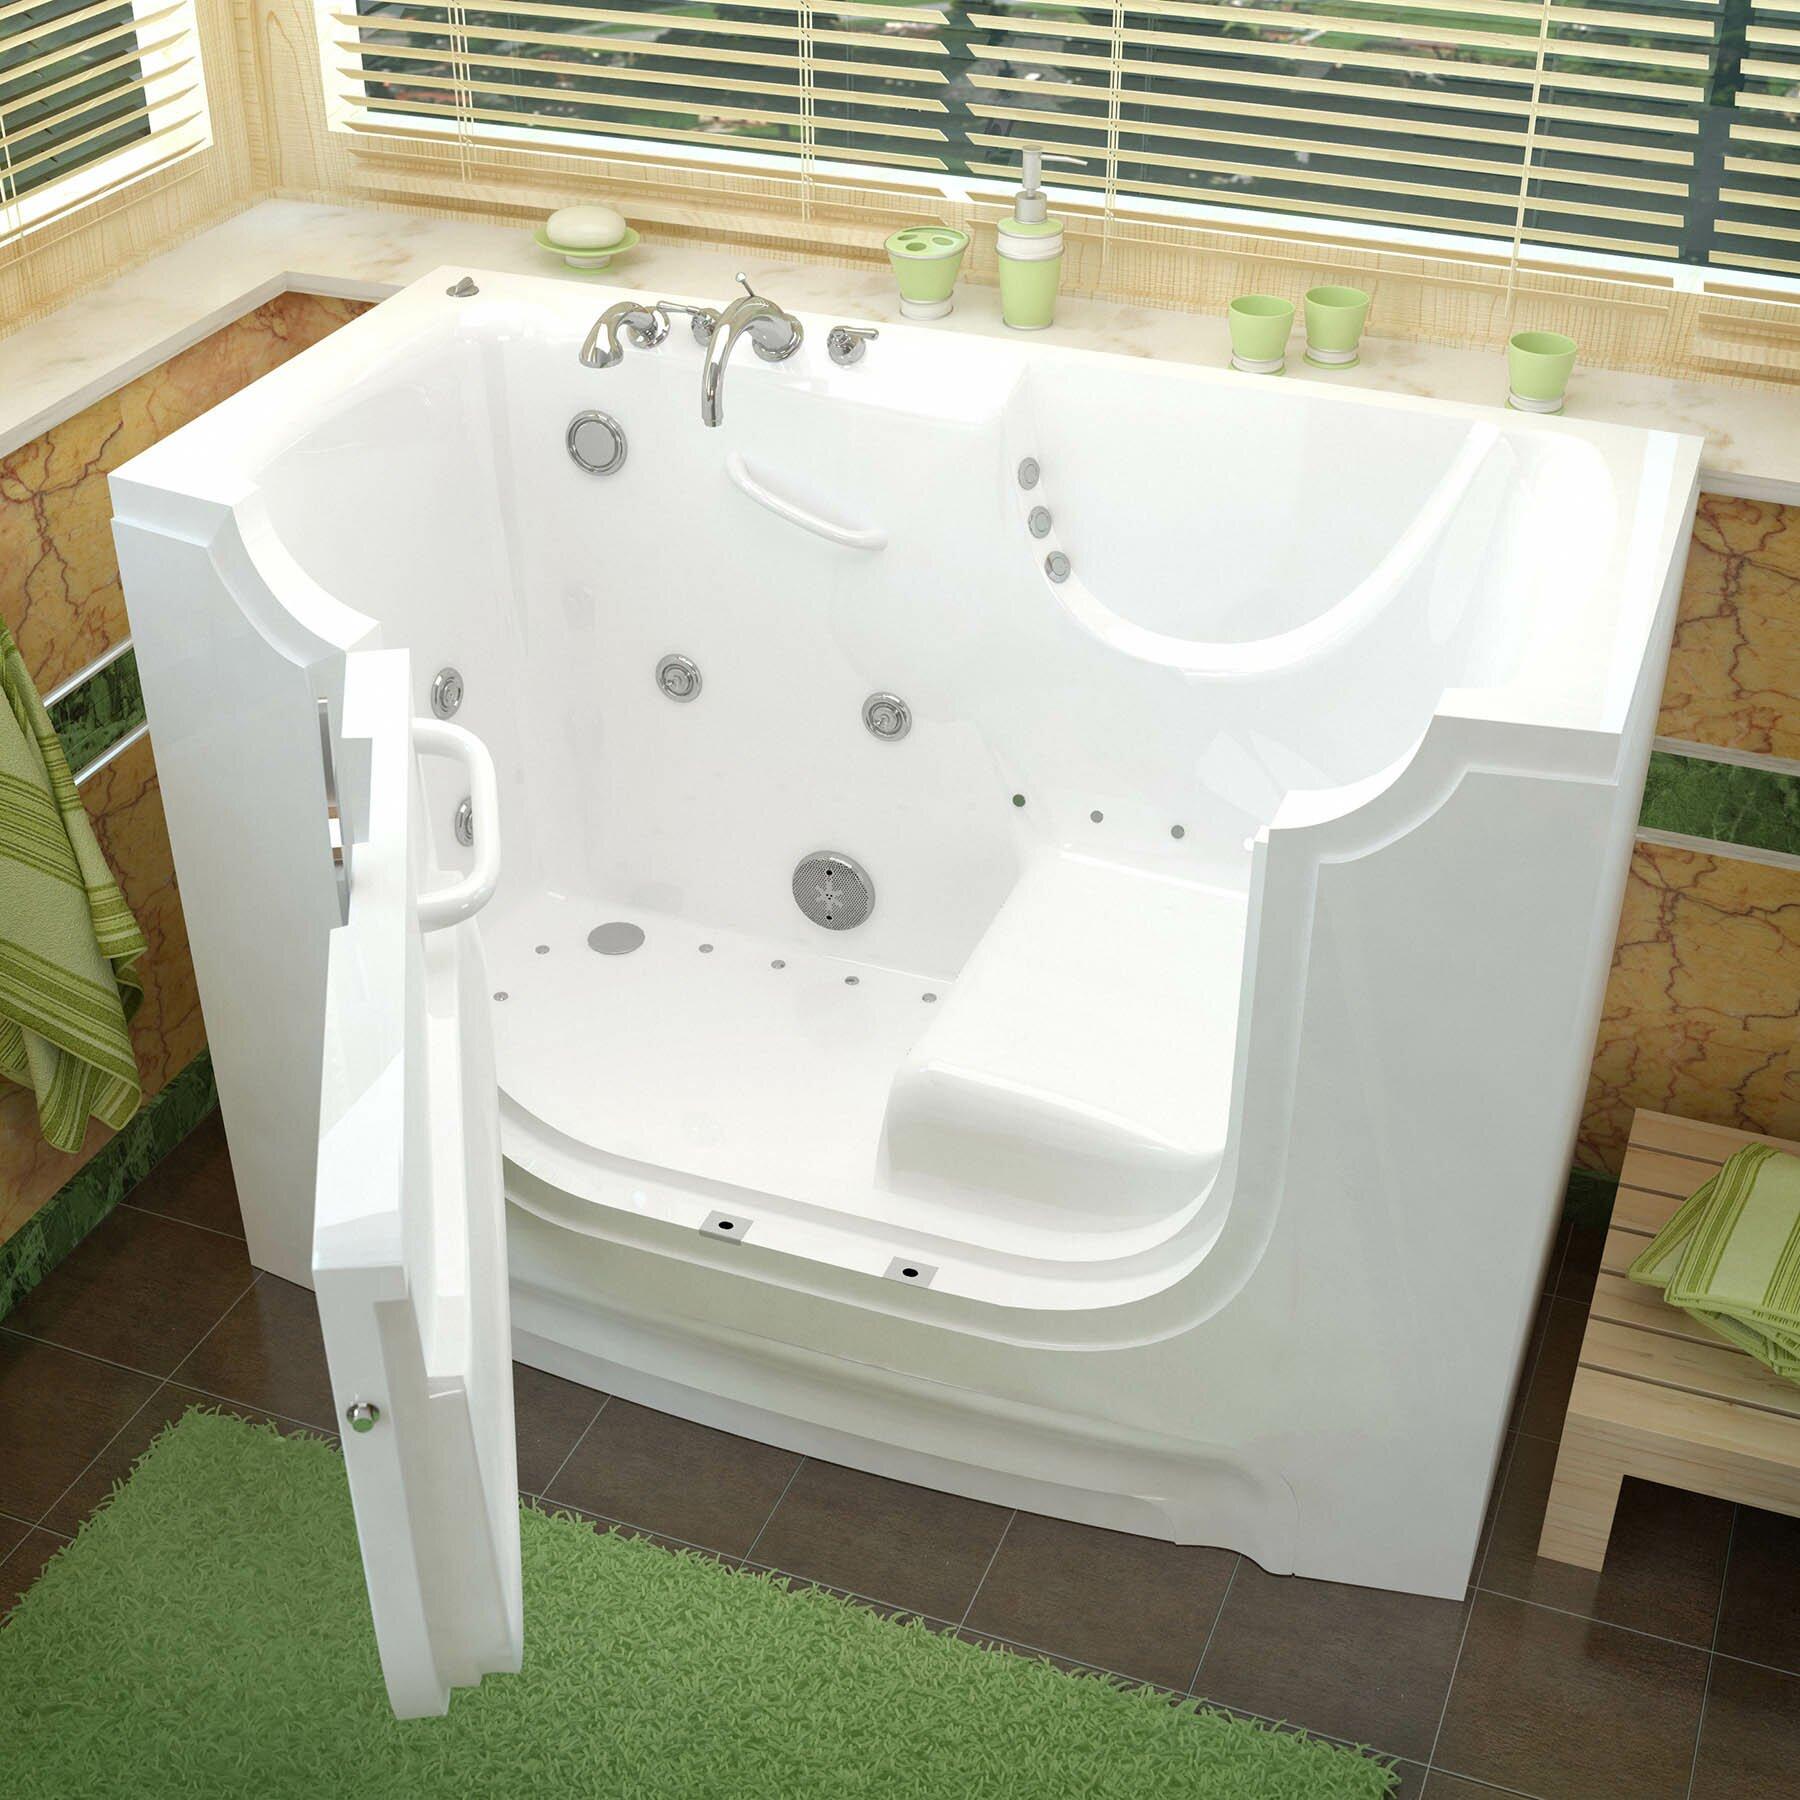 Therapeutic Tubs HandiTub  X  Whirlpool  Air Jetted - Lay down walk in bathtub